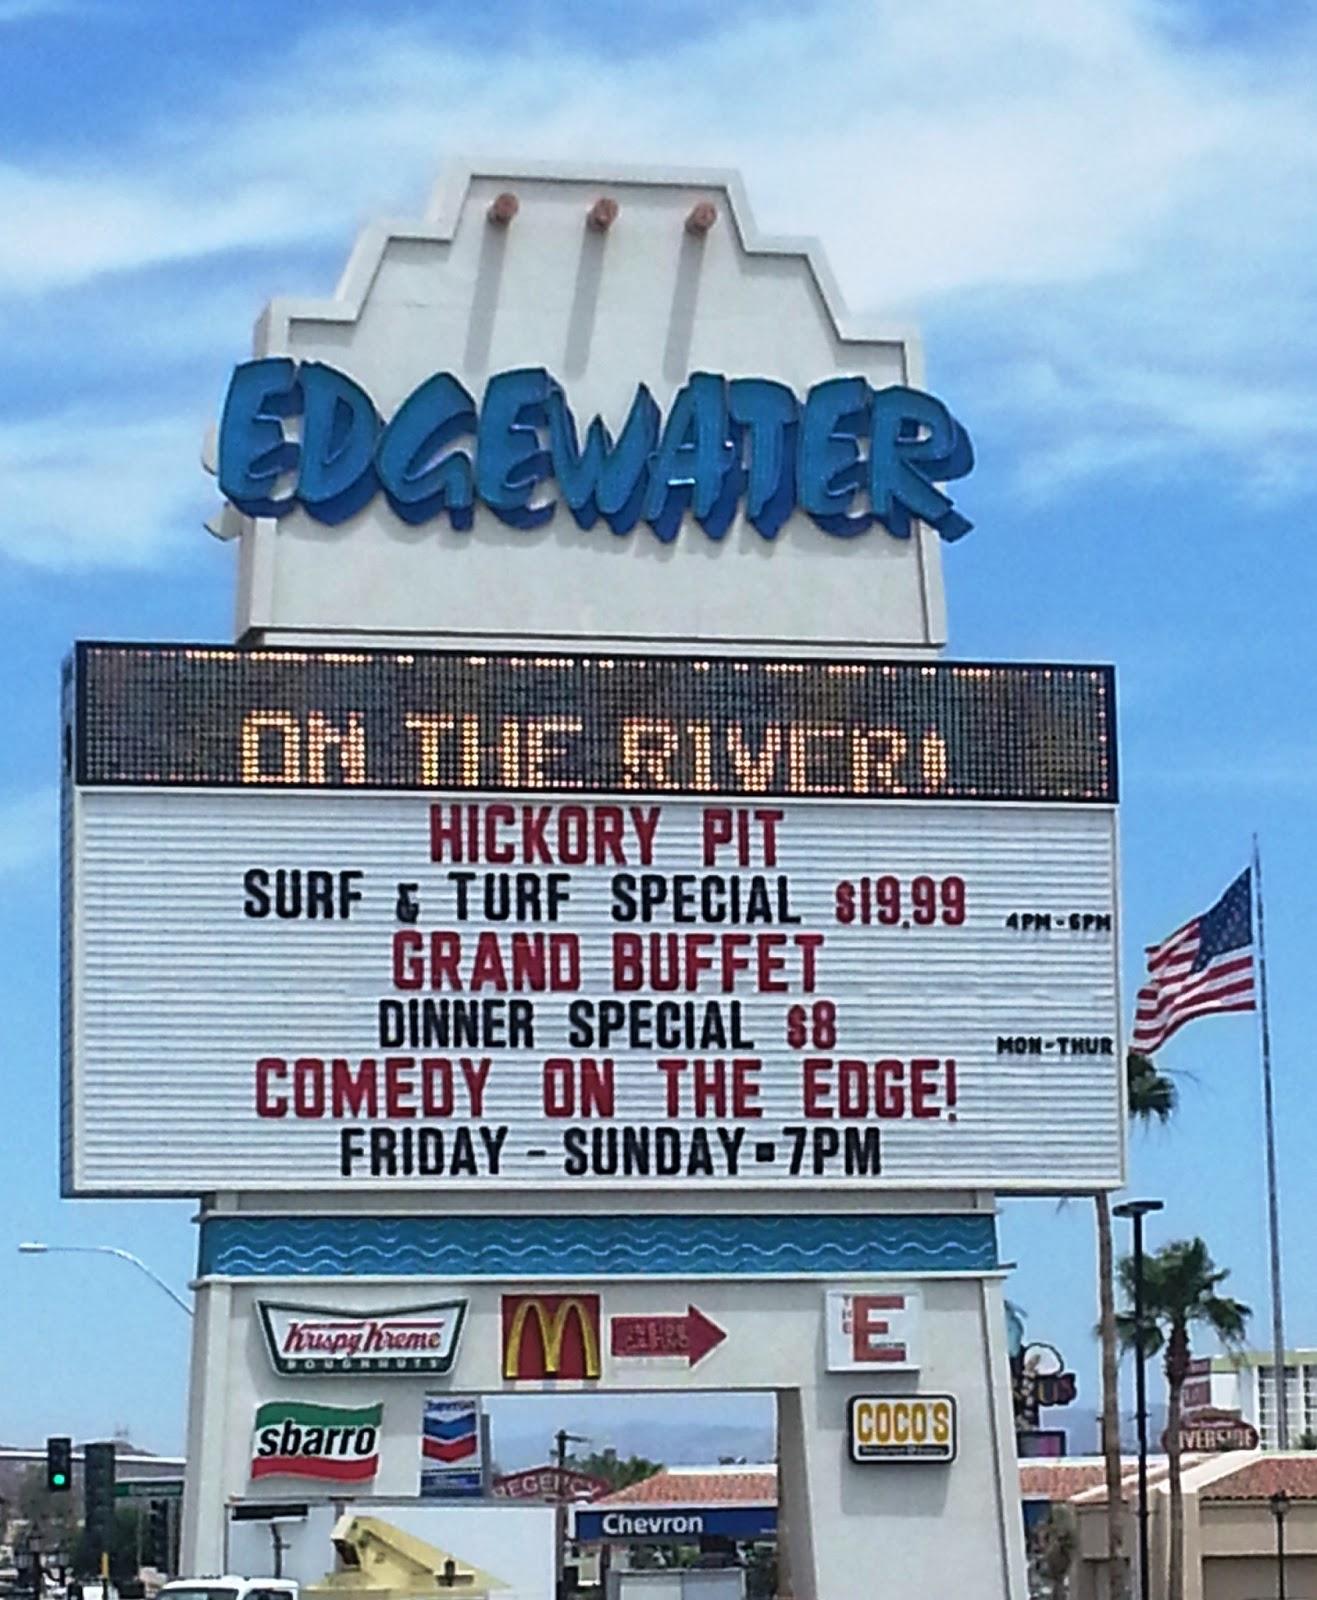 grand casino surf and turf buffet